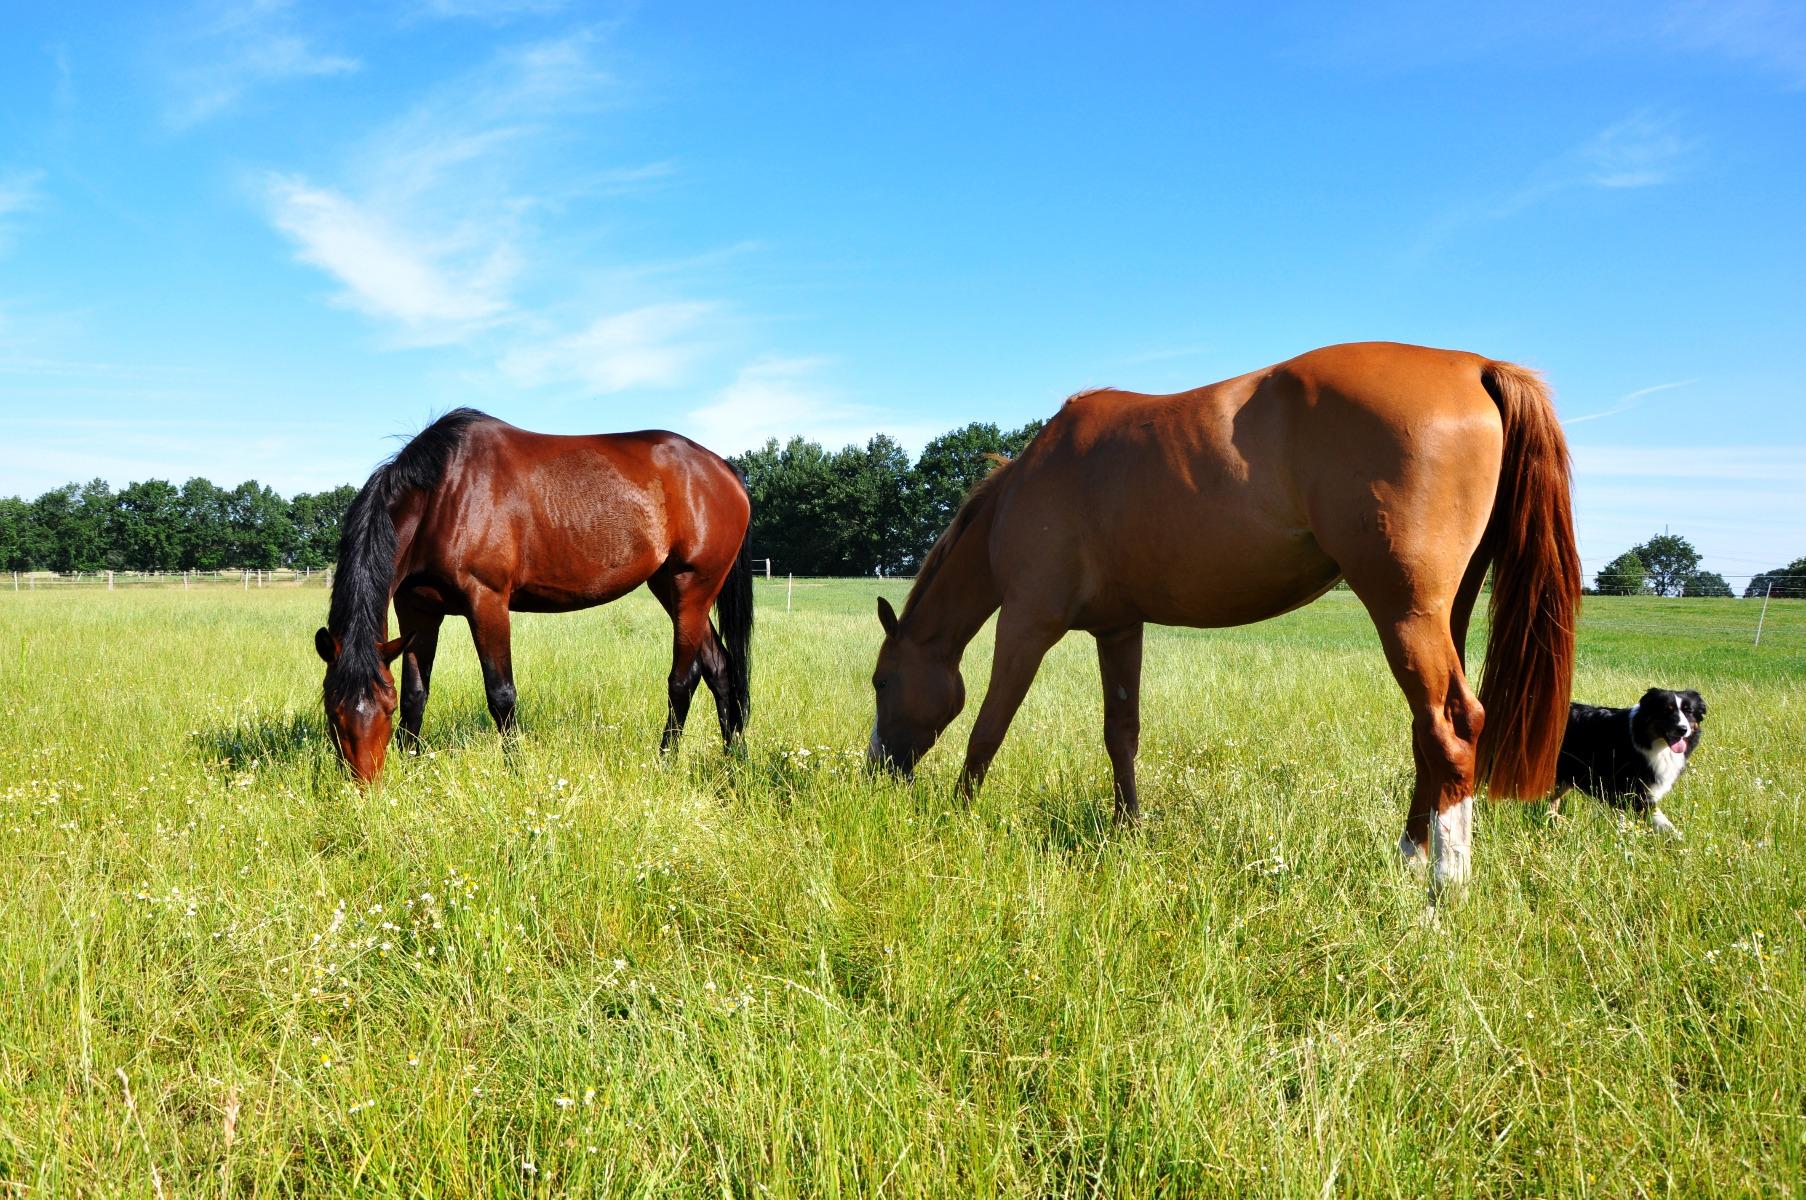 Stübben, Pferd, Pferde, Reiter, reiten, Sattel, Hund, Hunde, Reitbegleithunde